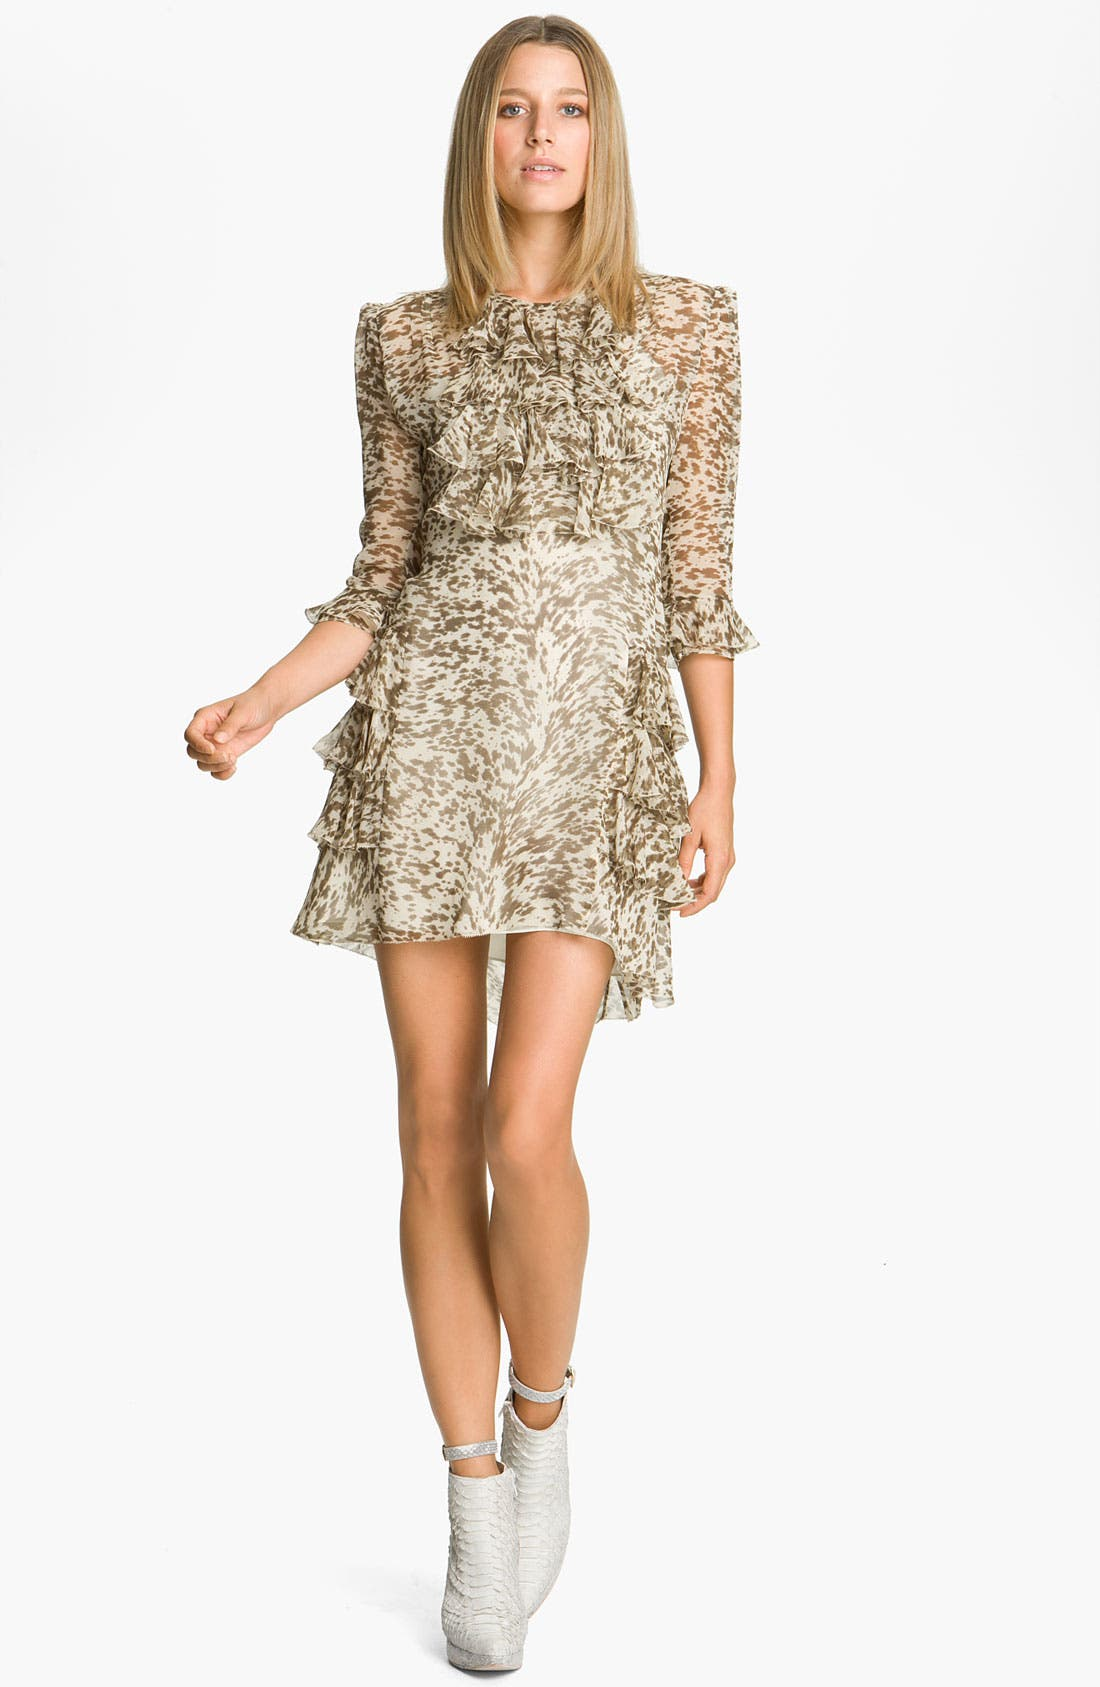 Alternate Image 1 Selected - Skaist-Taylor Ruffled Chiffon Dress